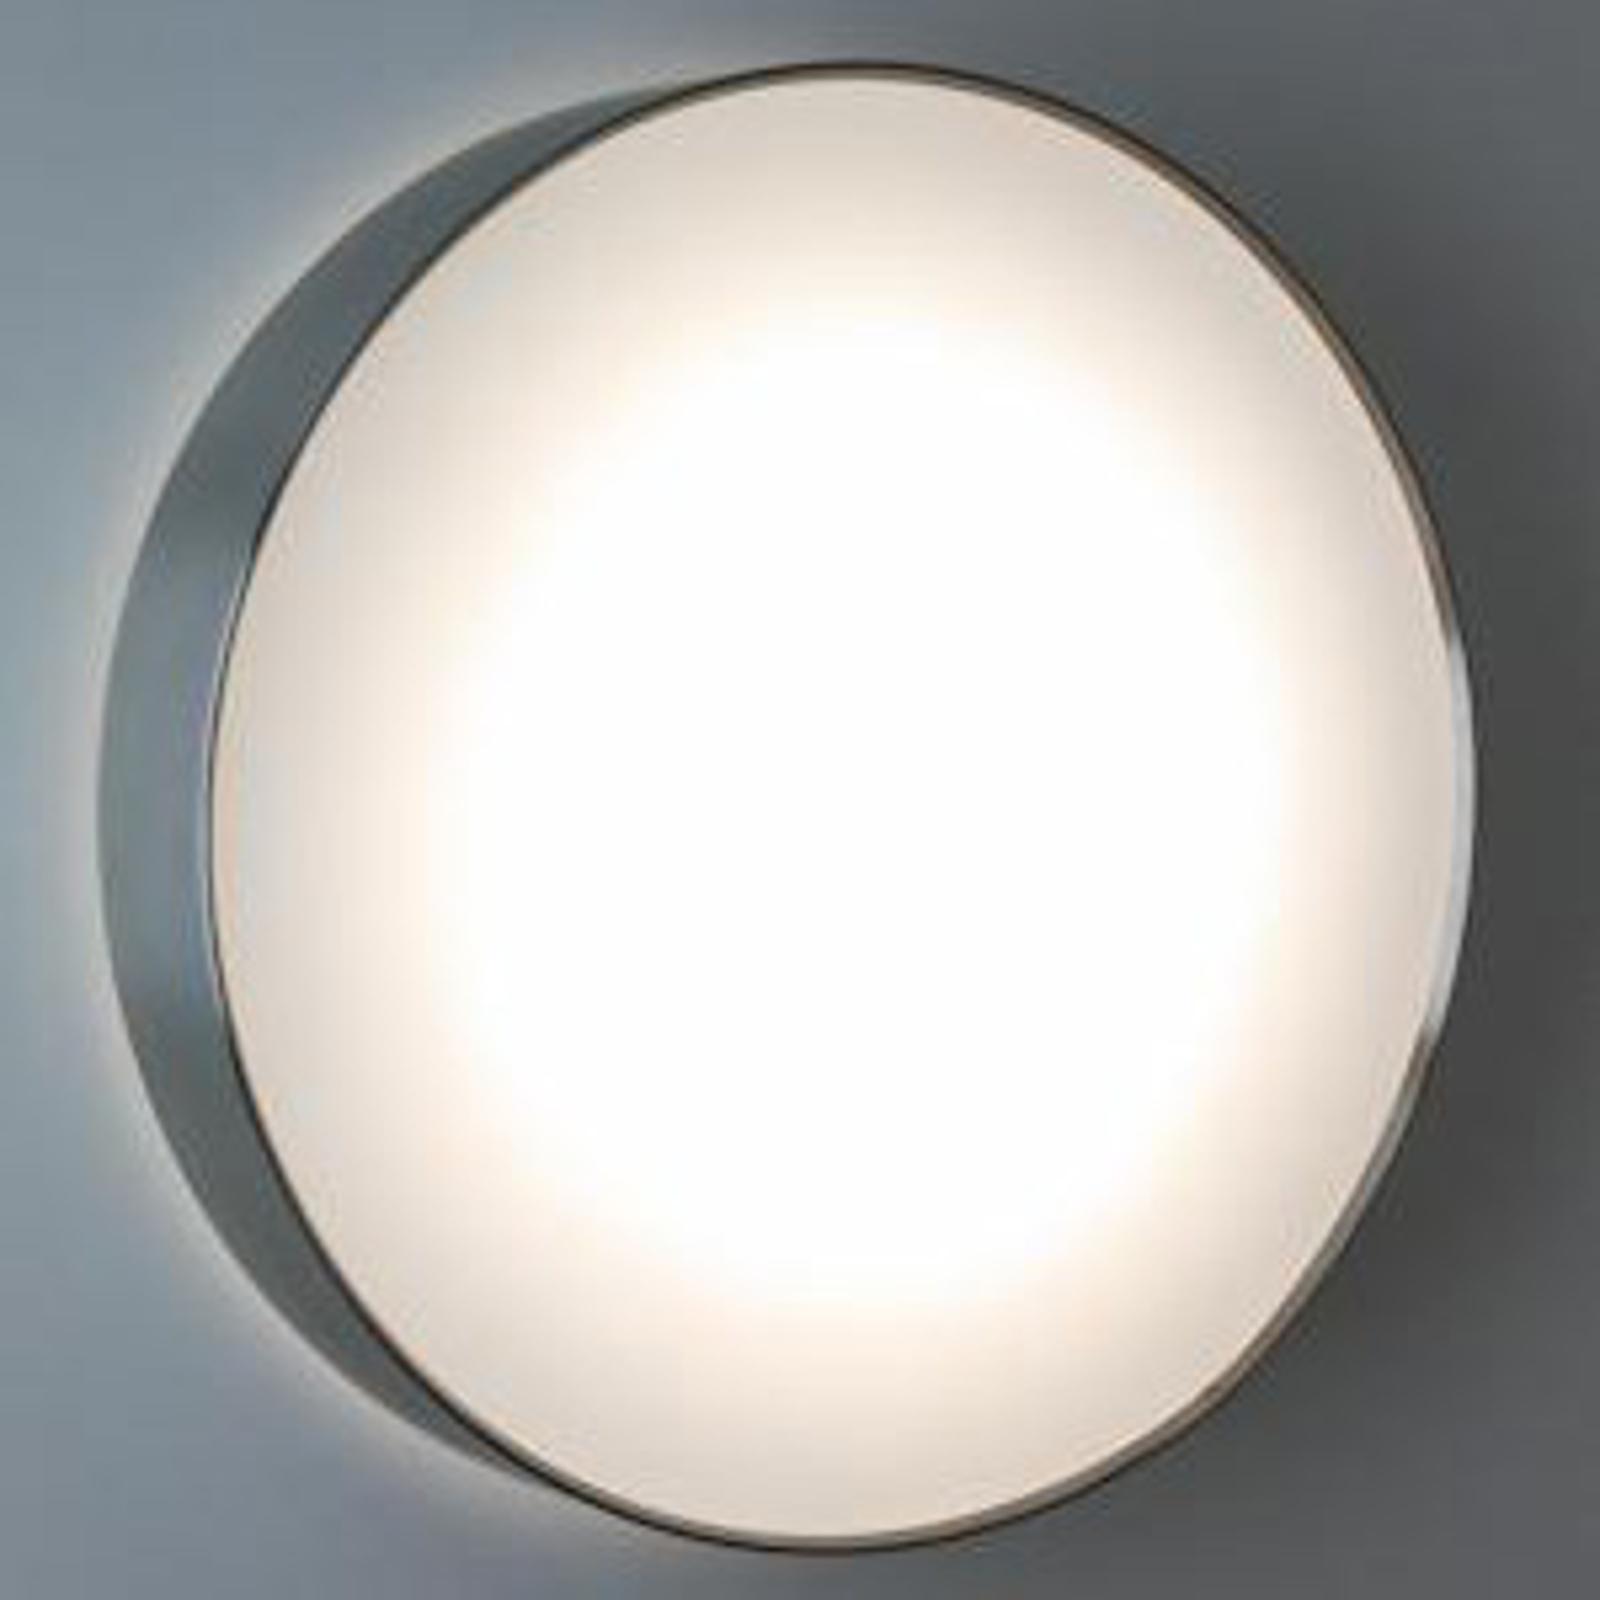 Snímačová LED lampa ušľachtilá oceľ SUN 4 13W_1018196_1